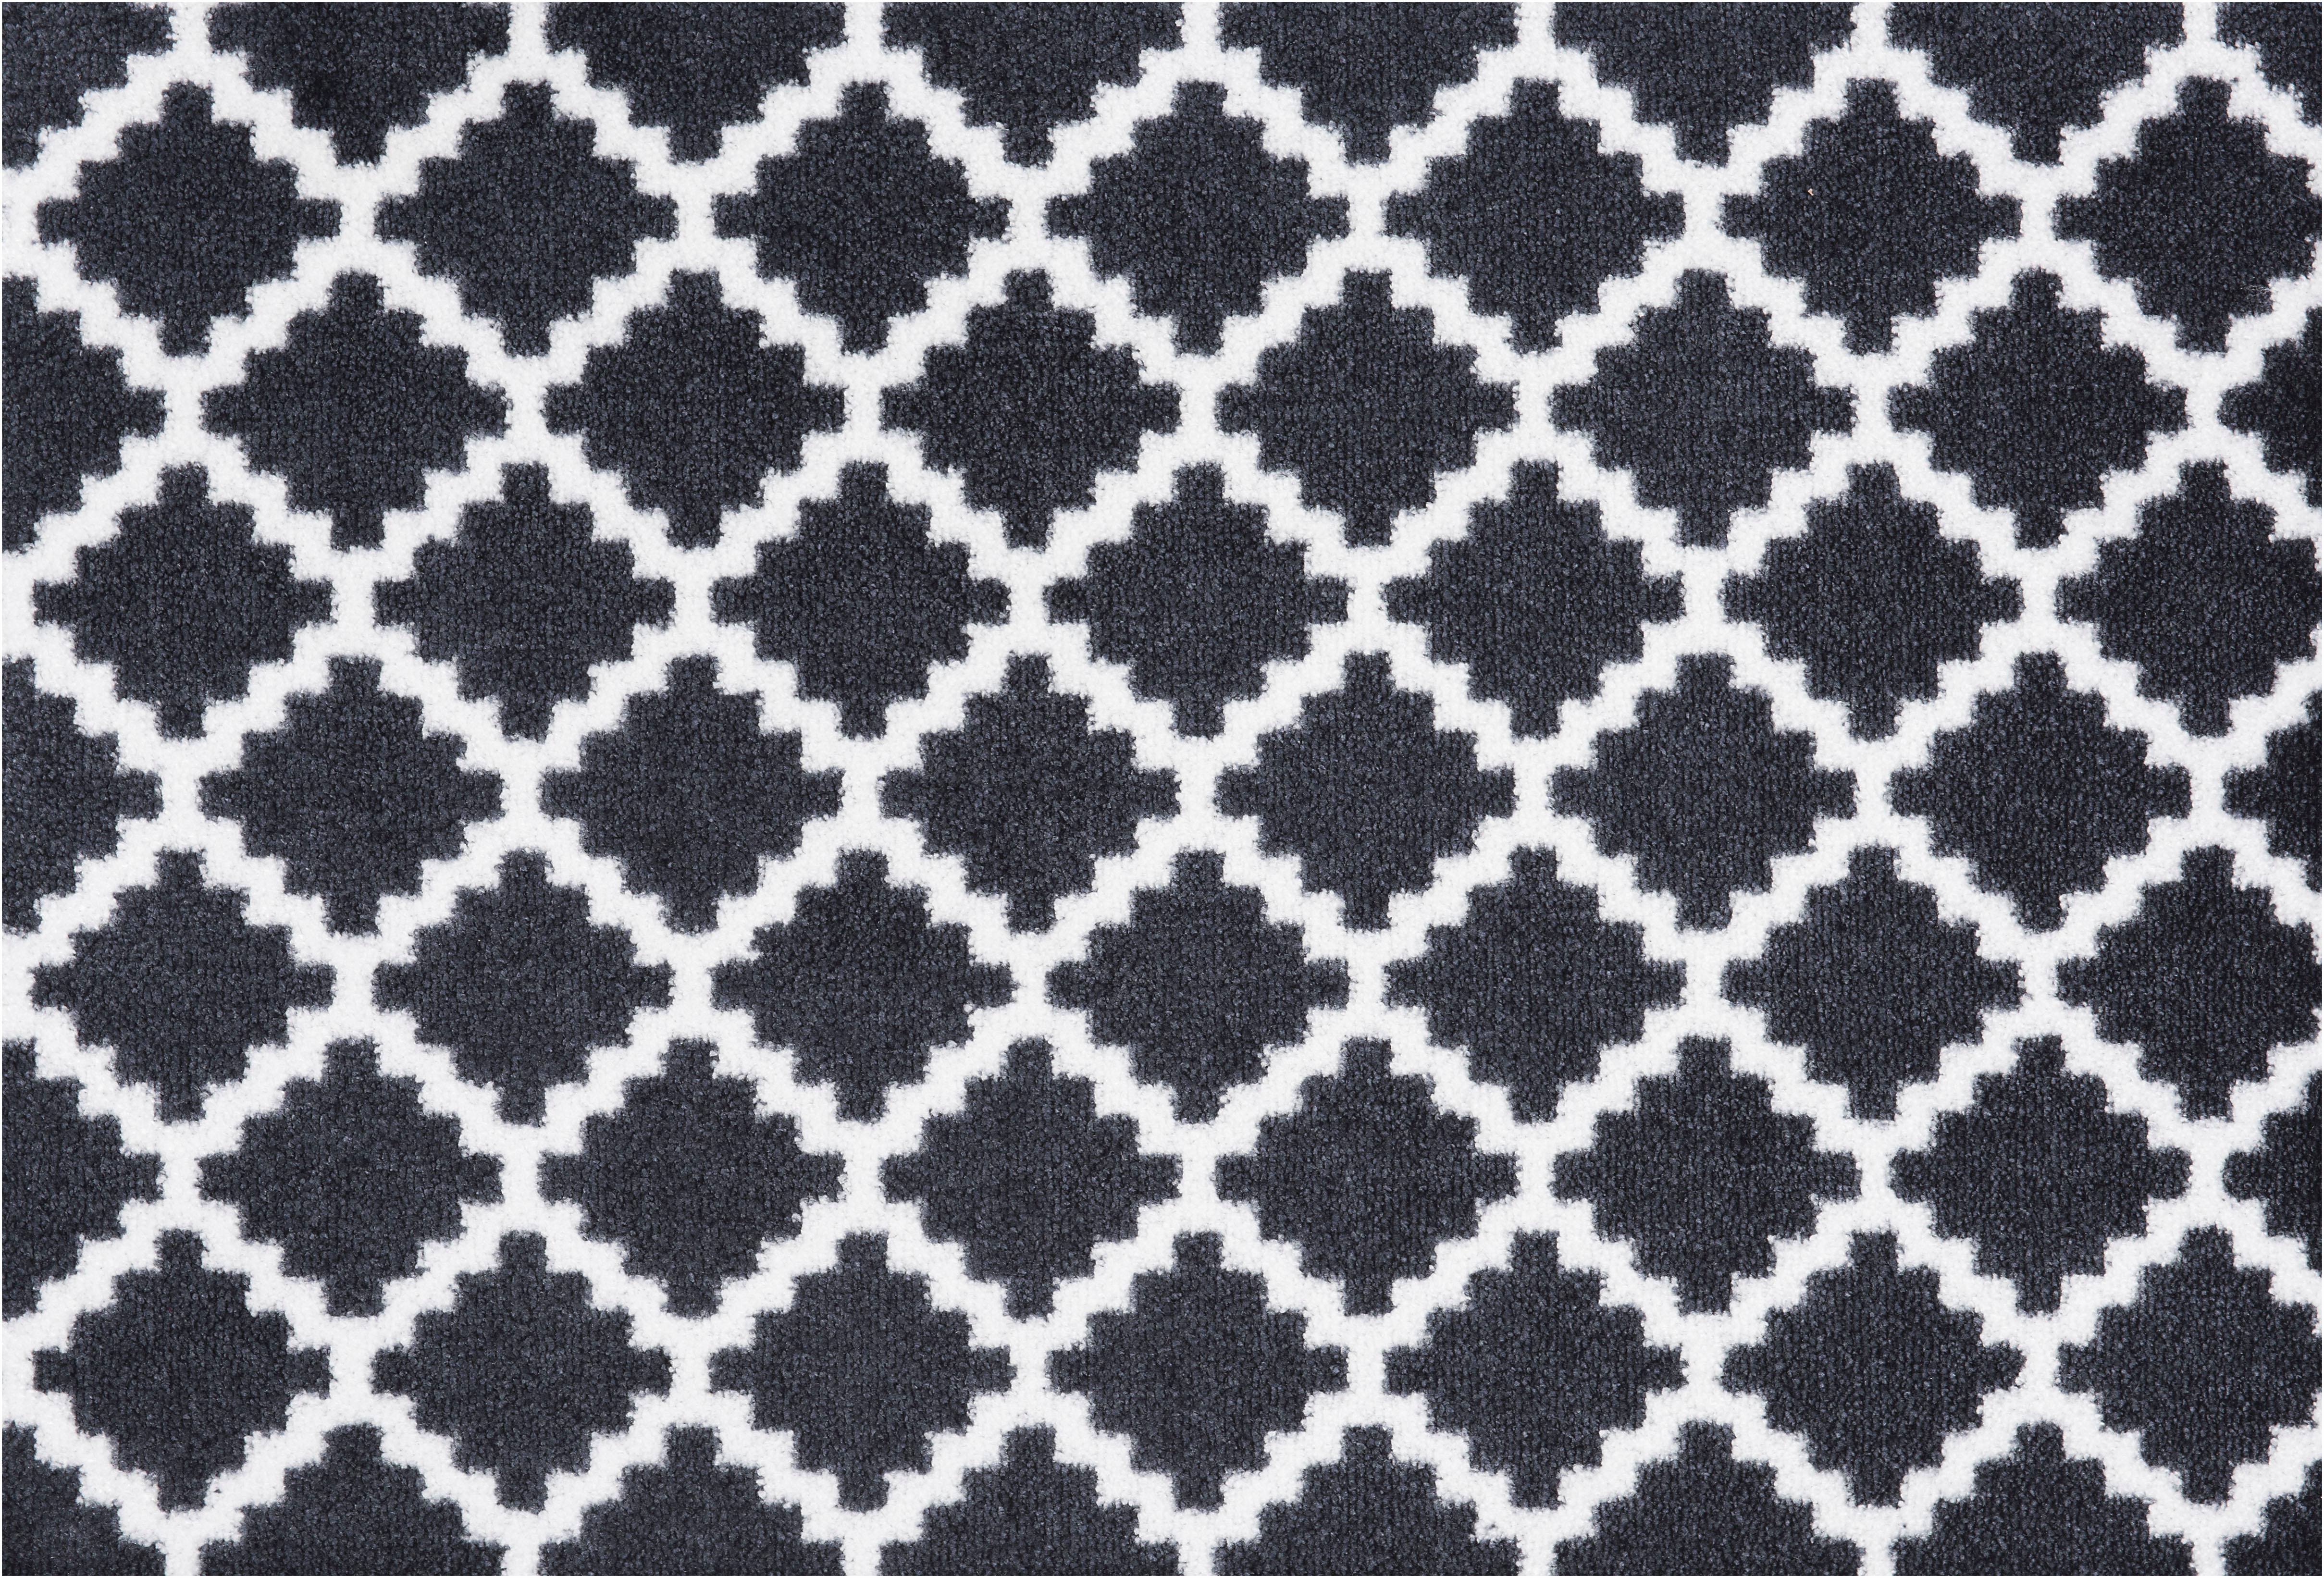 Fußmatte Elegance Zala Living rechteckig Höhe 7 mm maschinell getuftet